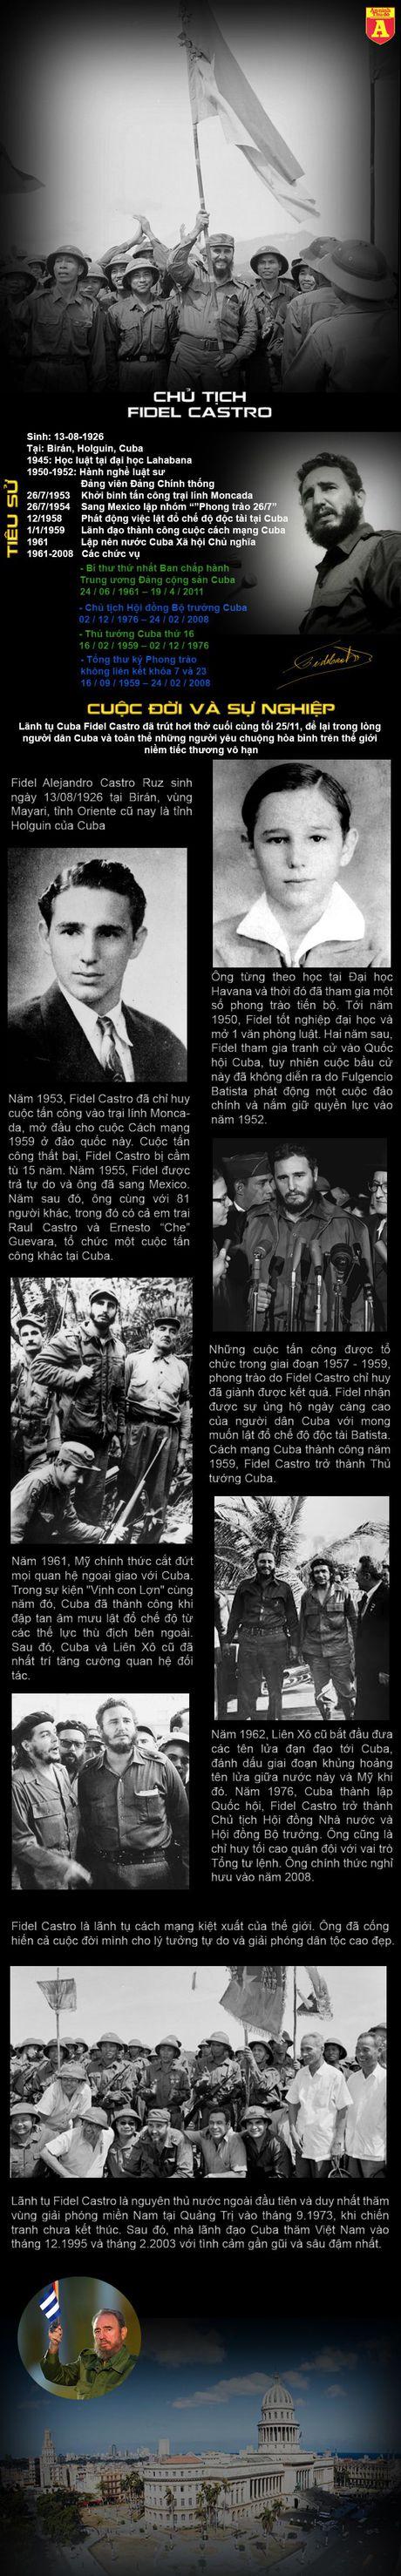 Lanh tu Fidel Castro- Vi anh hung cua nhan dan Cuba - Anh 1